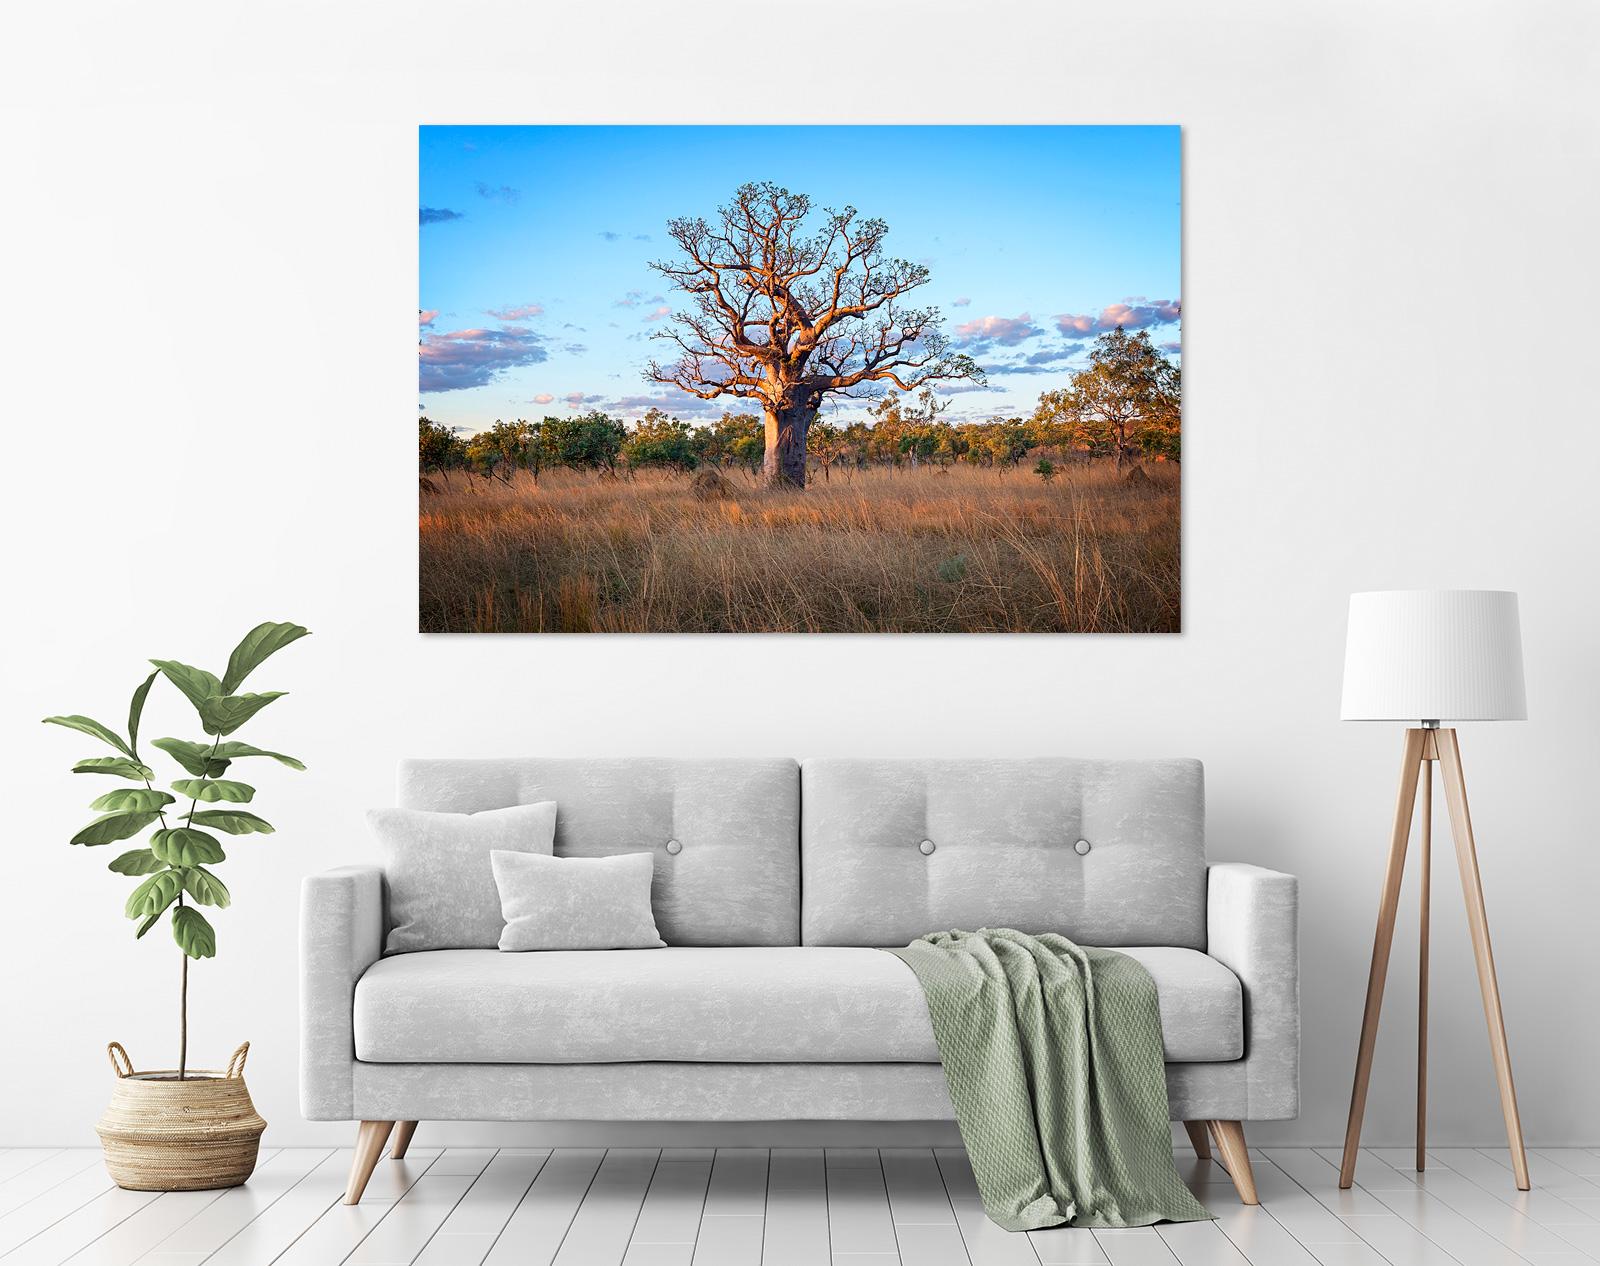 Jason Mazur - 'Boab Tree, Kimberley 032' in a room